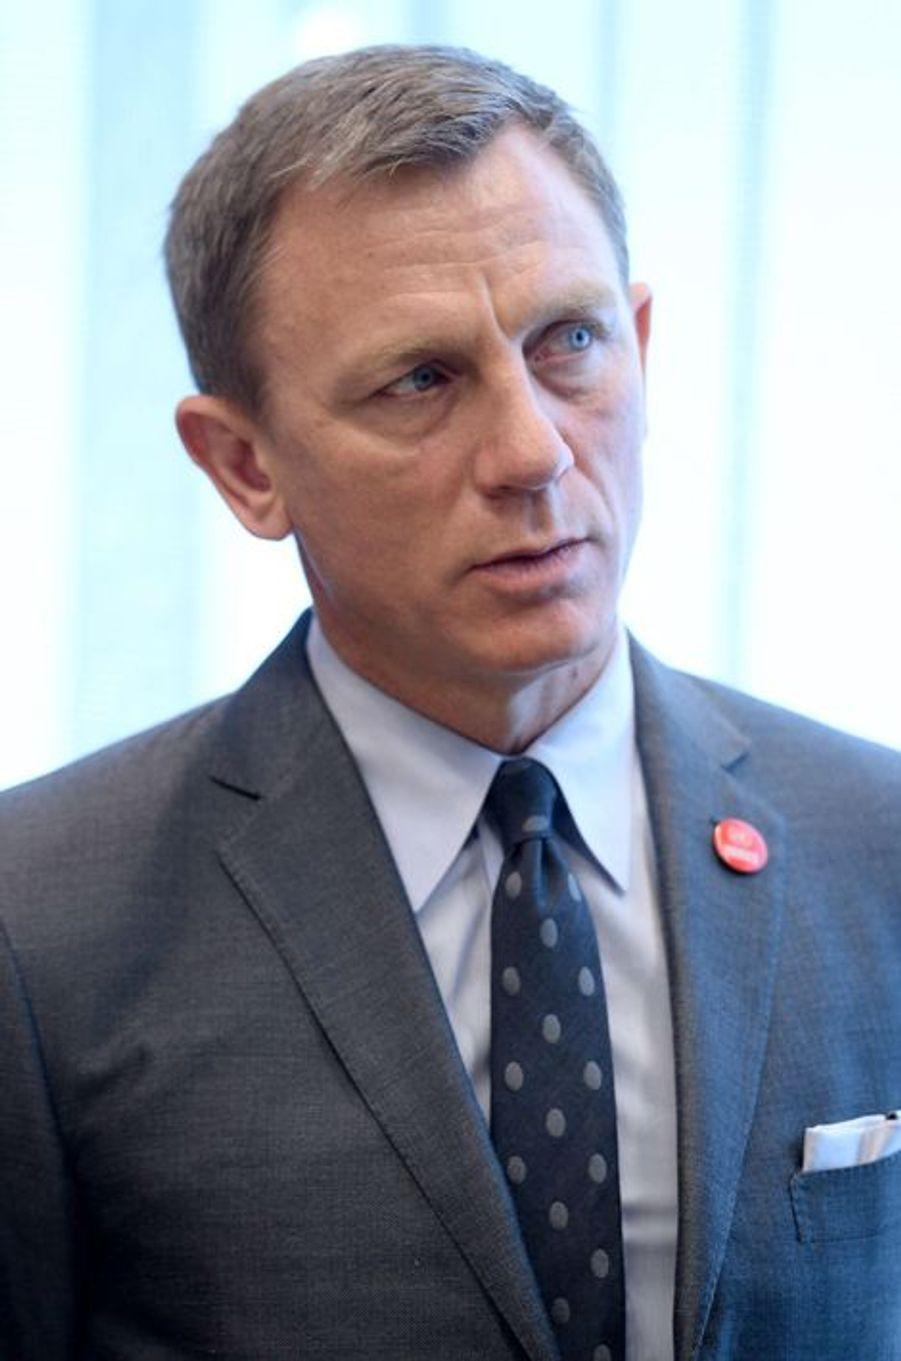 Daniel Craig à New York le 14 avril 2015